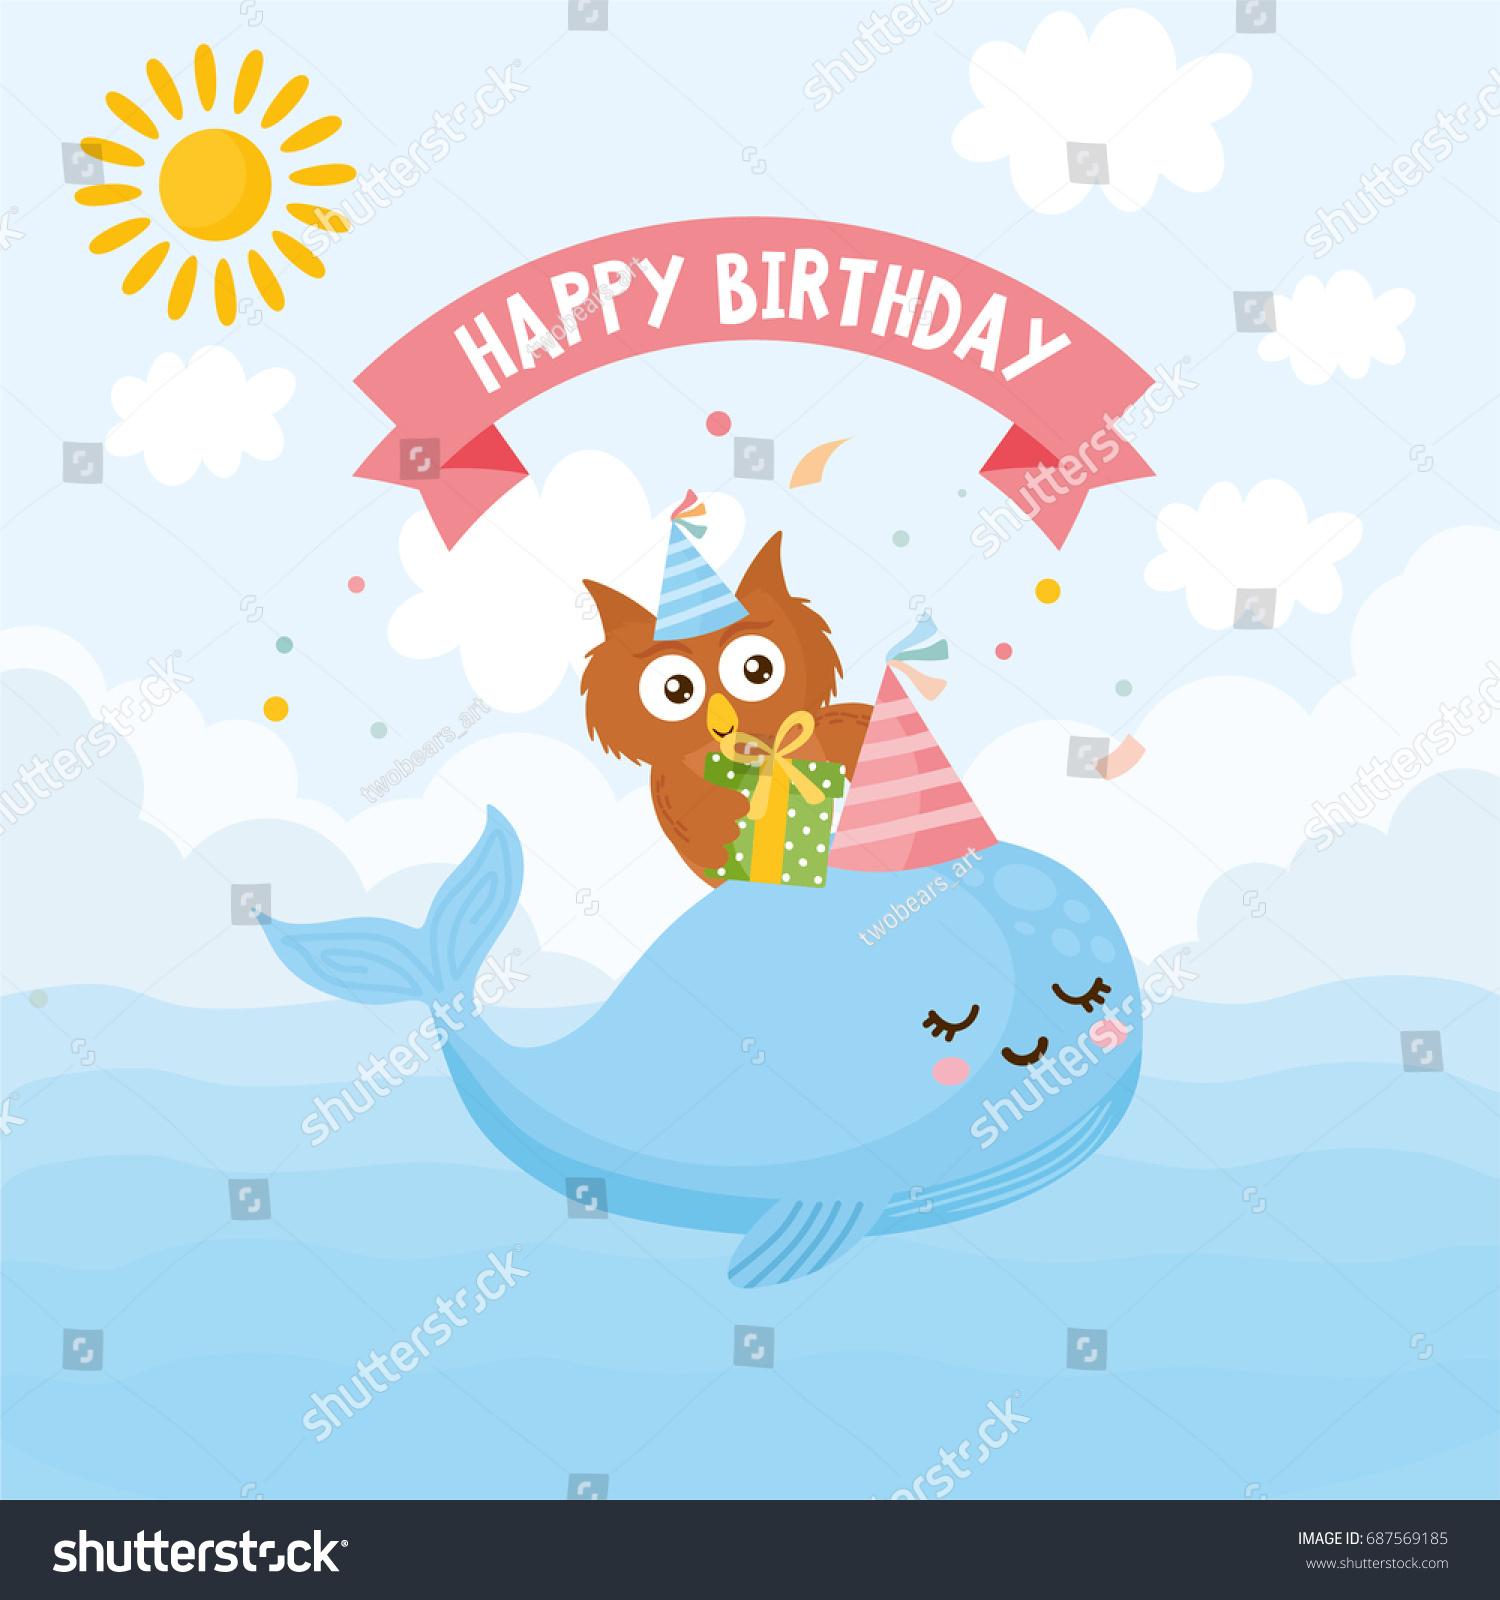 Happy Birthday Greeting Card Kids Illustration Stock Vector Royalty